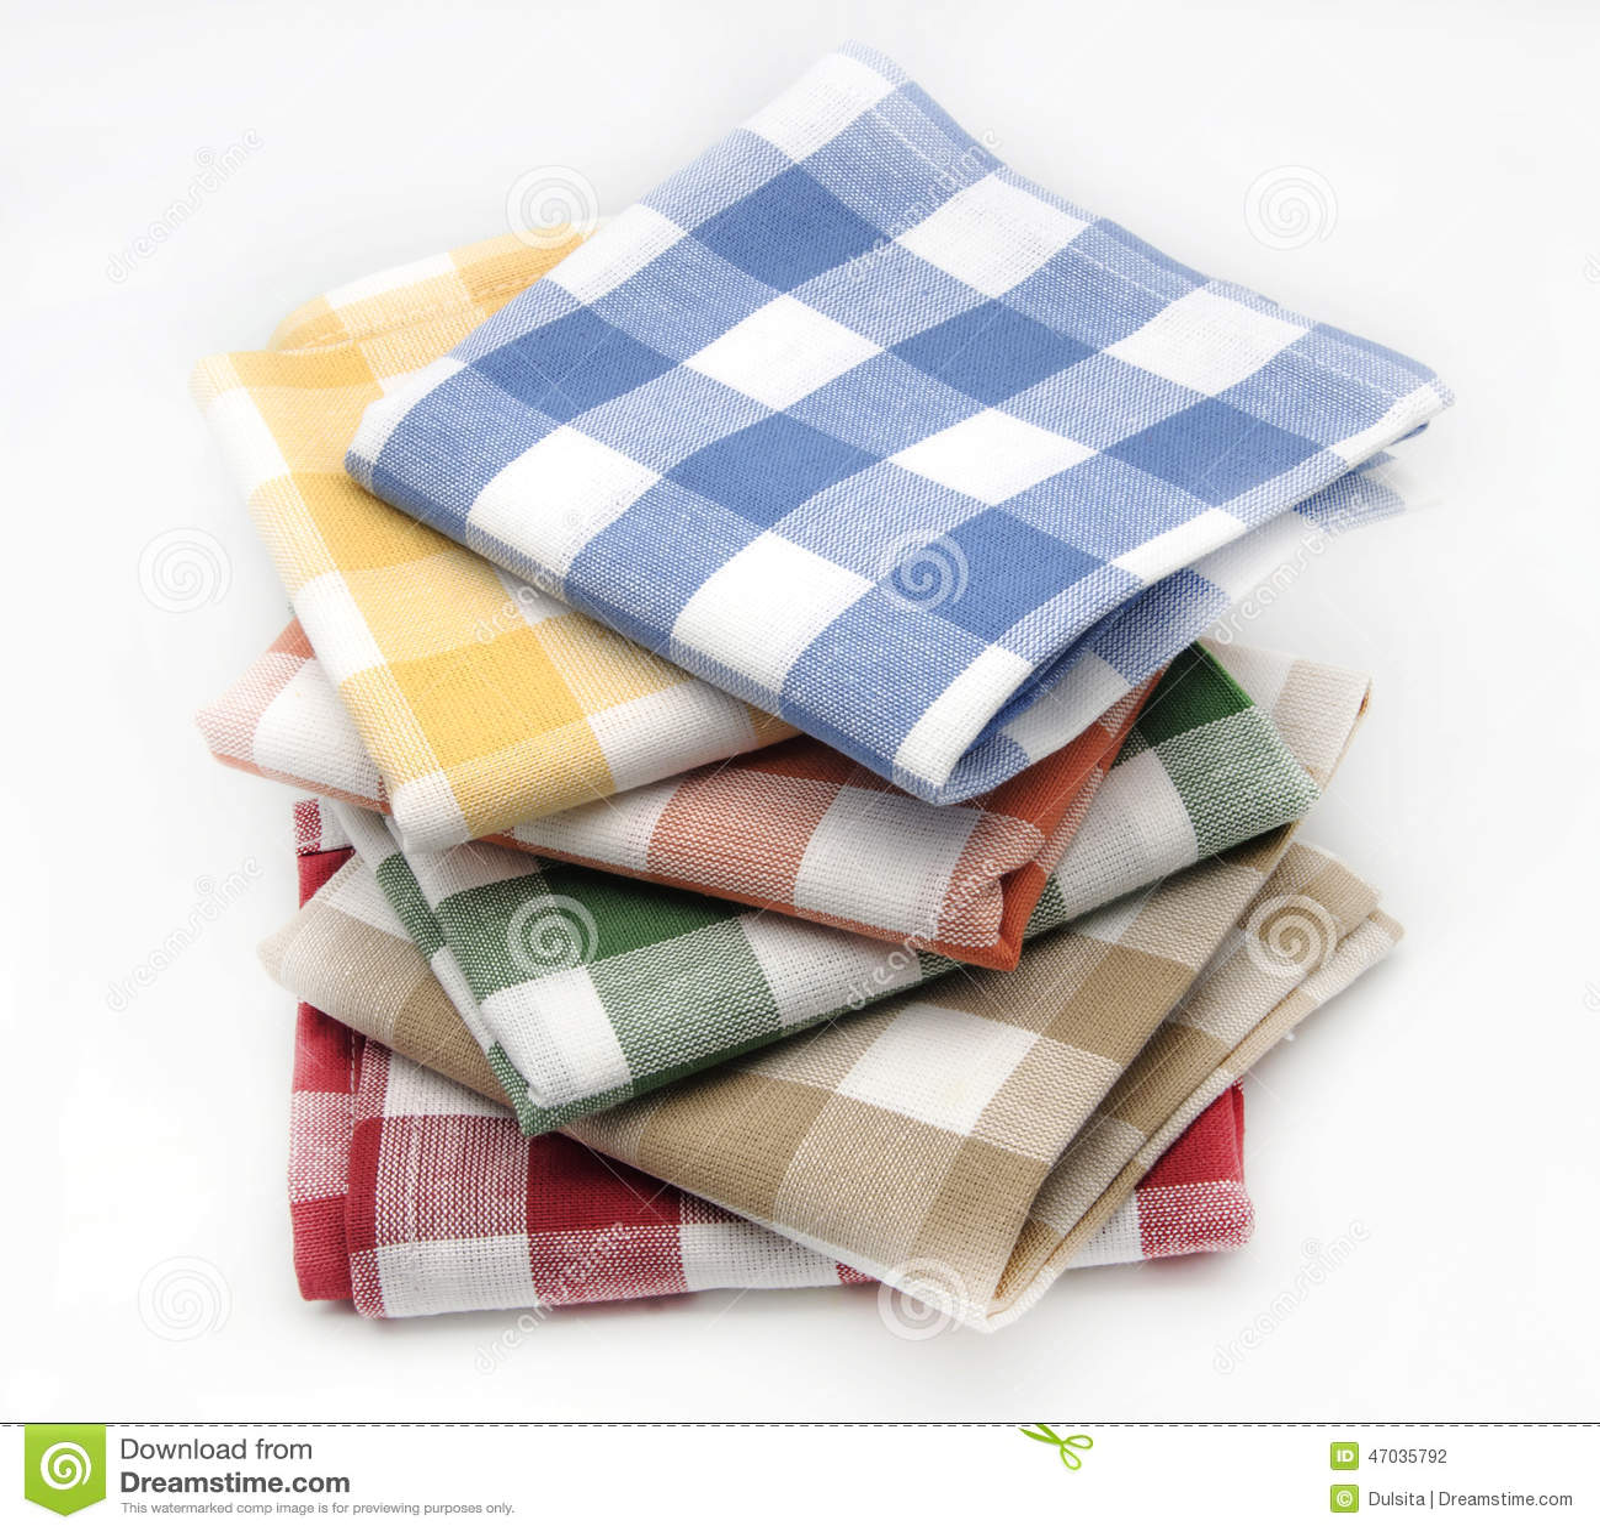 kitchen linens lowes ceiling lights 厨房亚麻布库存照片 图片包括有蓝色 线程数 材料 设计 卫生学 初生 厨房亚麻布